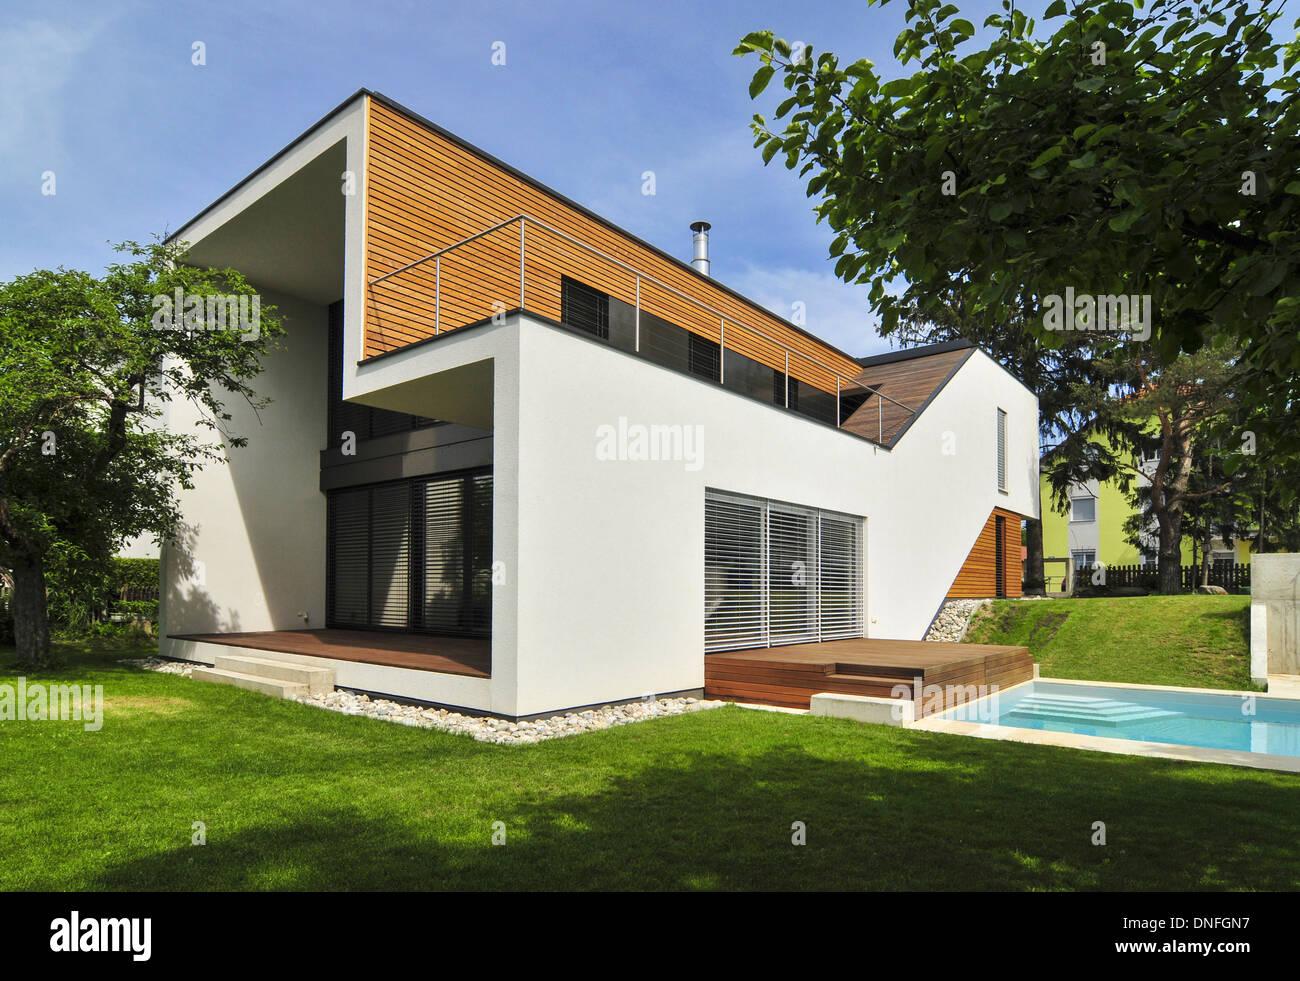 wohnhaus familie troppmann einfamilienhaus haas architektur stock photo royalty free image. Black Bedroom Furniture Sets. Home Design Ideas